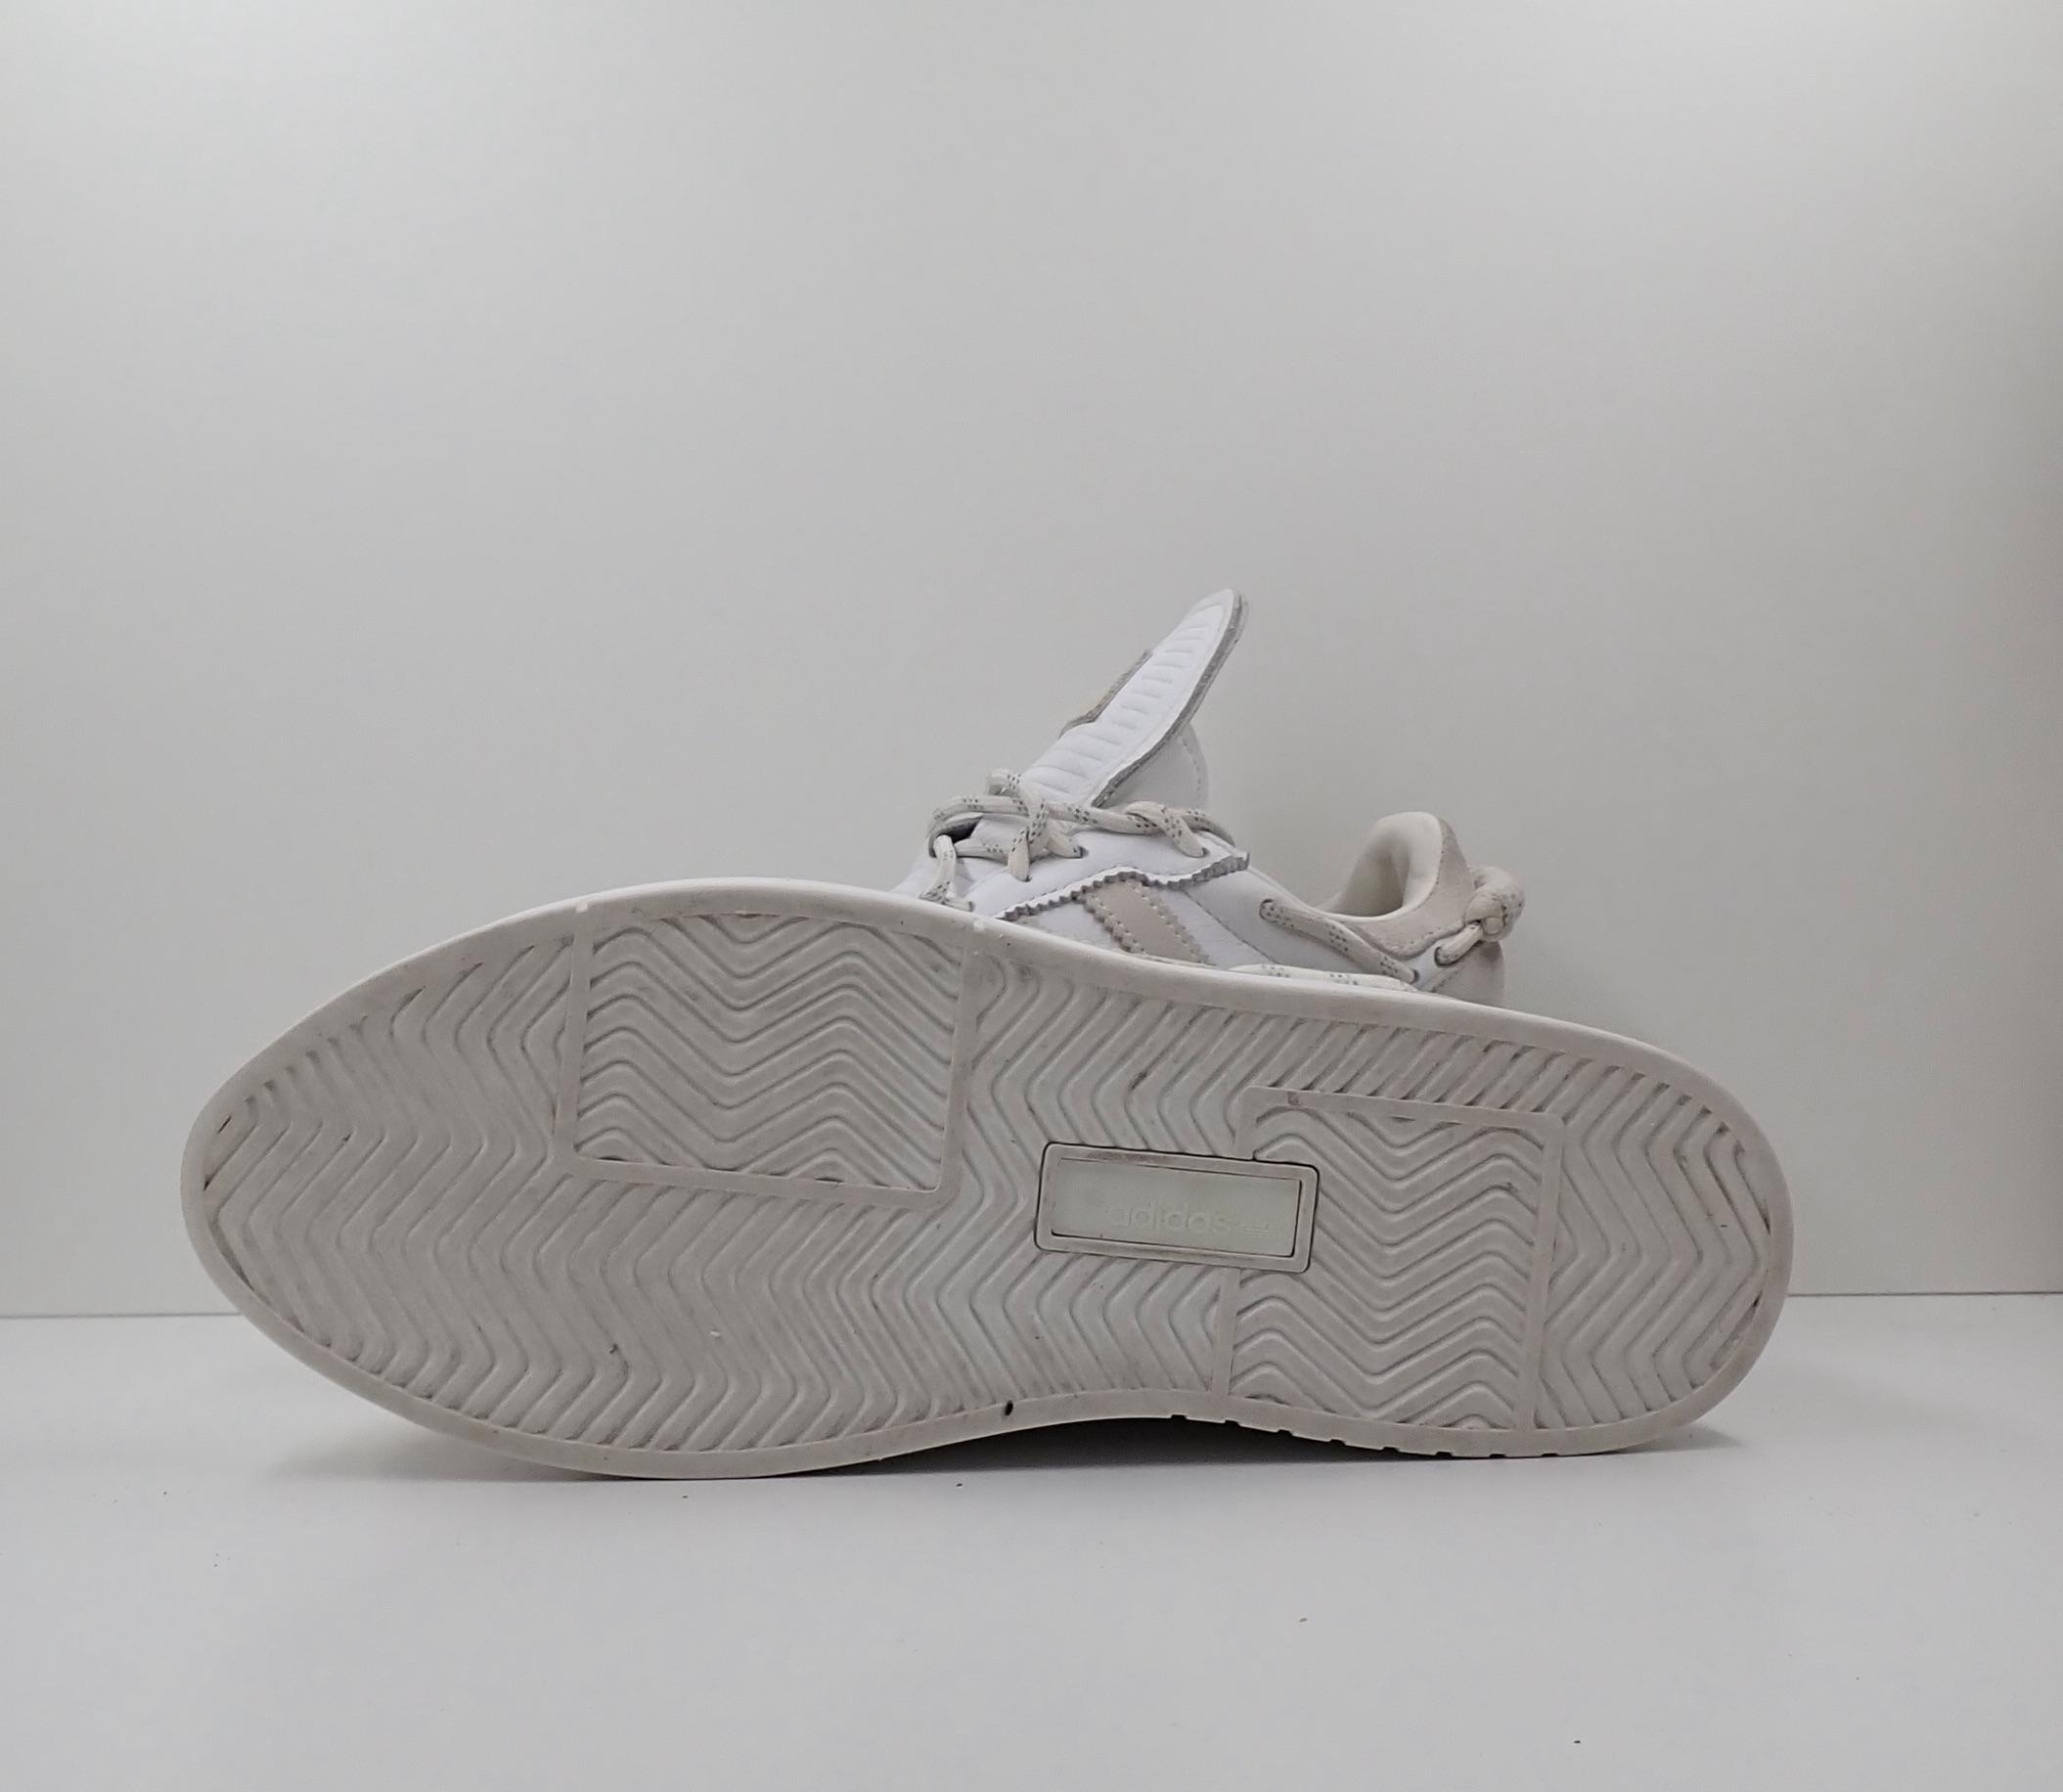 Adidas Supersleek 72 Ivy Park Icy Park (W)